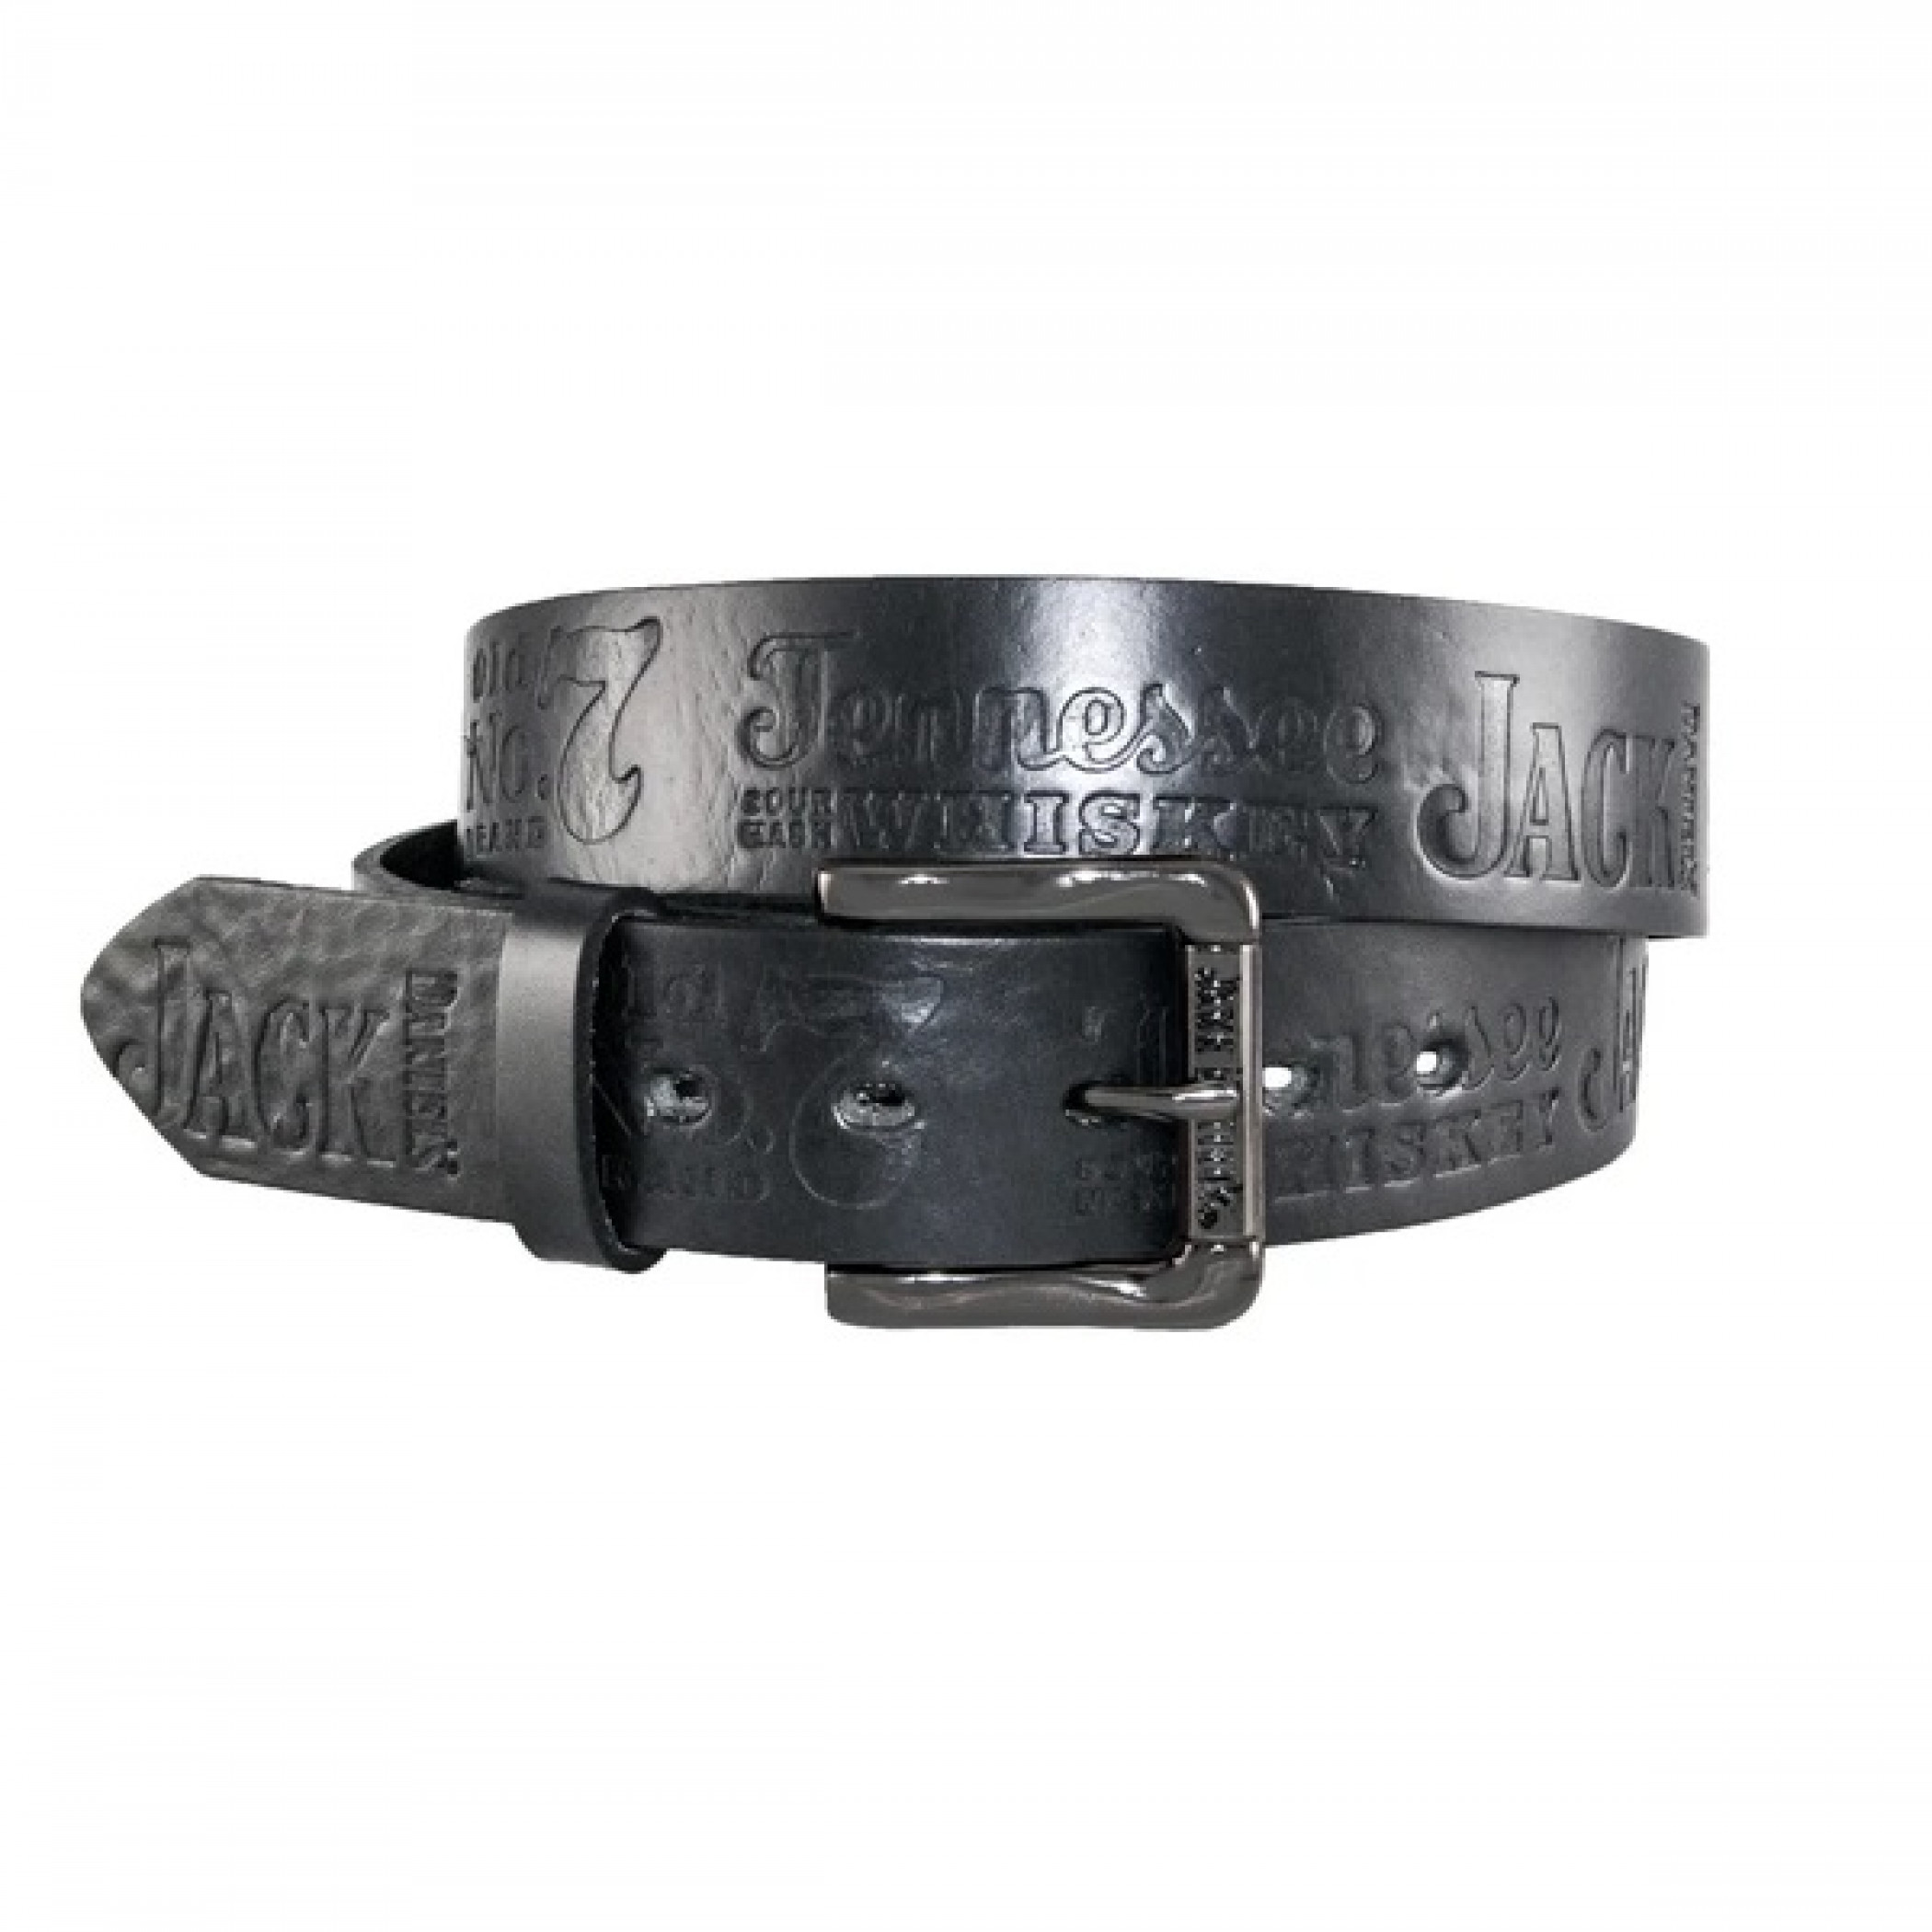 "Jack Daniel's Black Leather Embossed 1.5"" Belt"